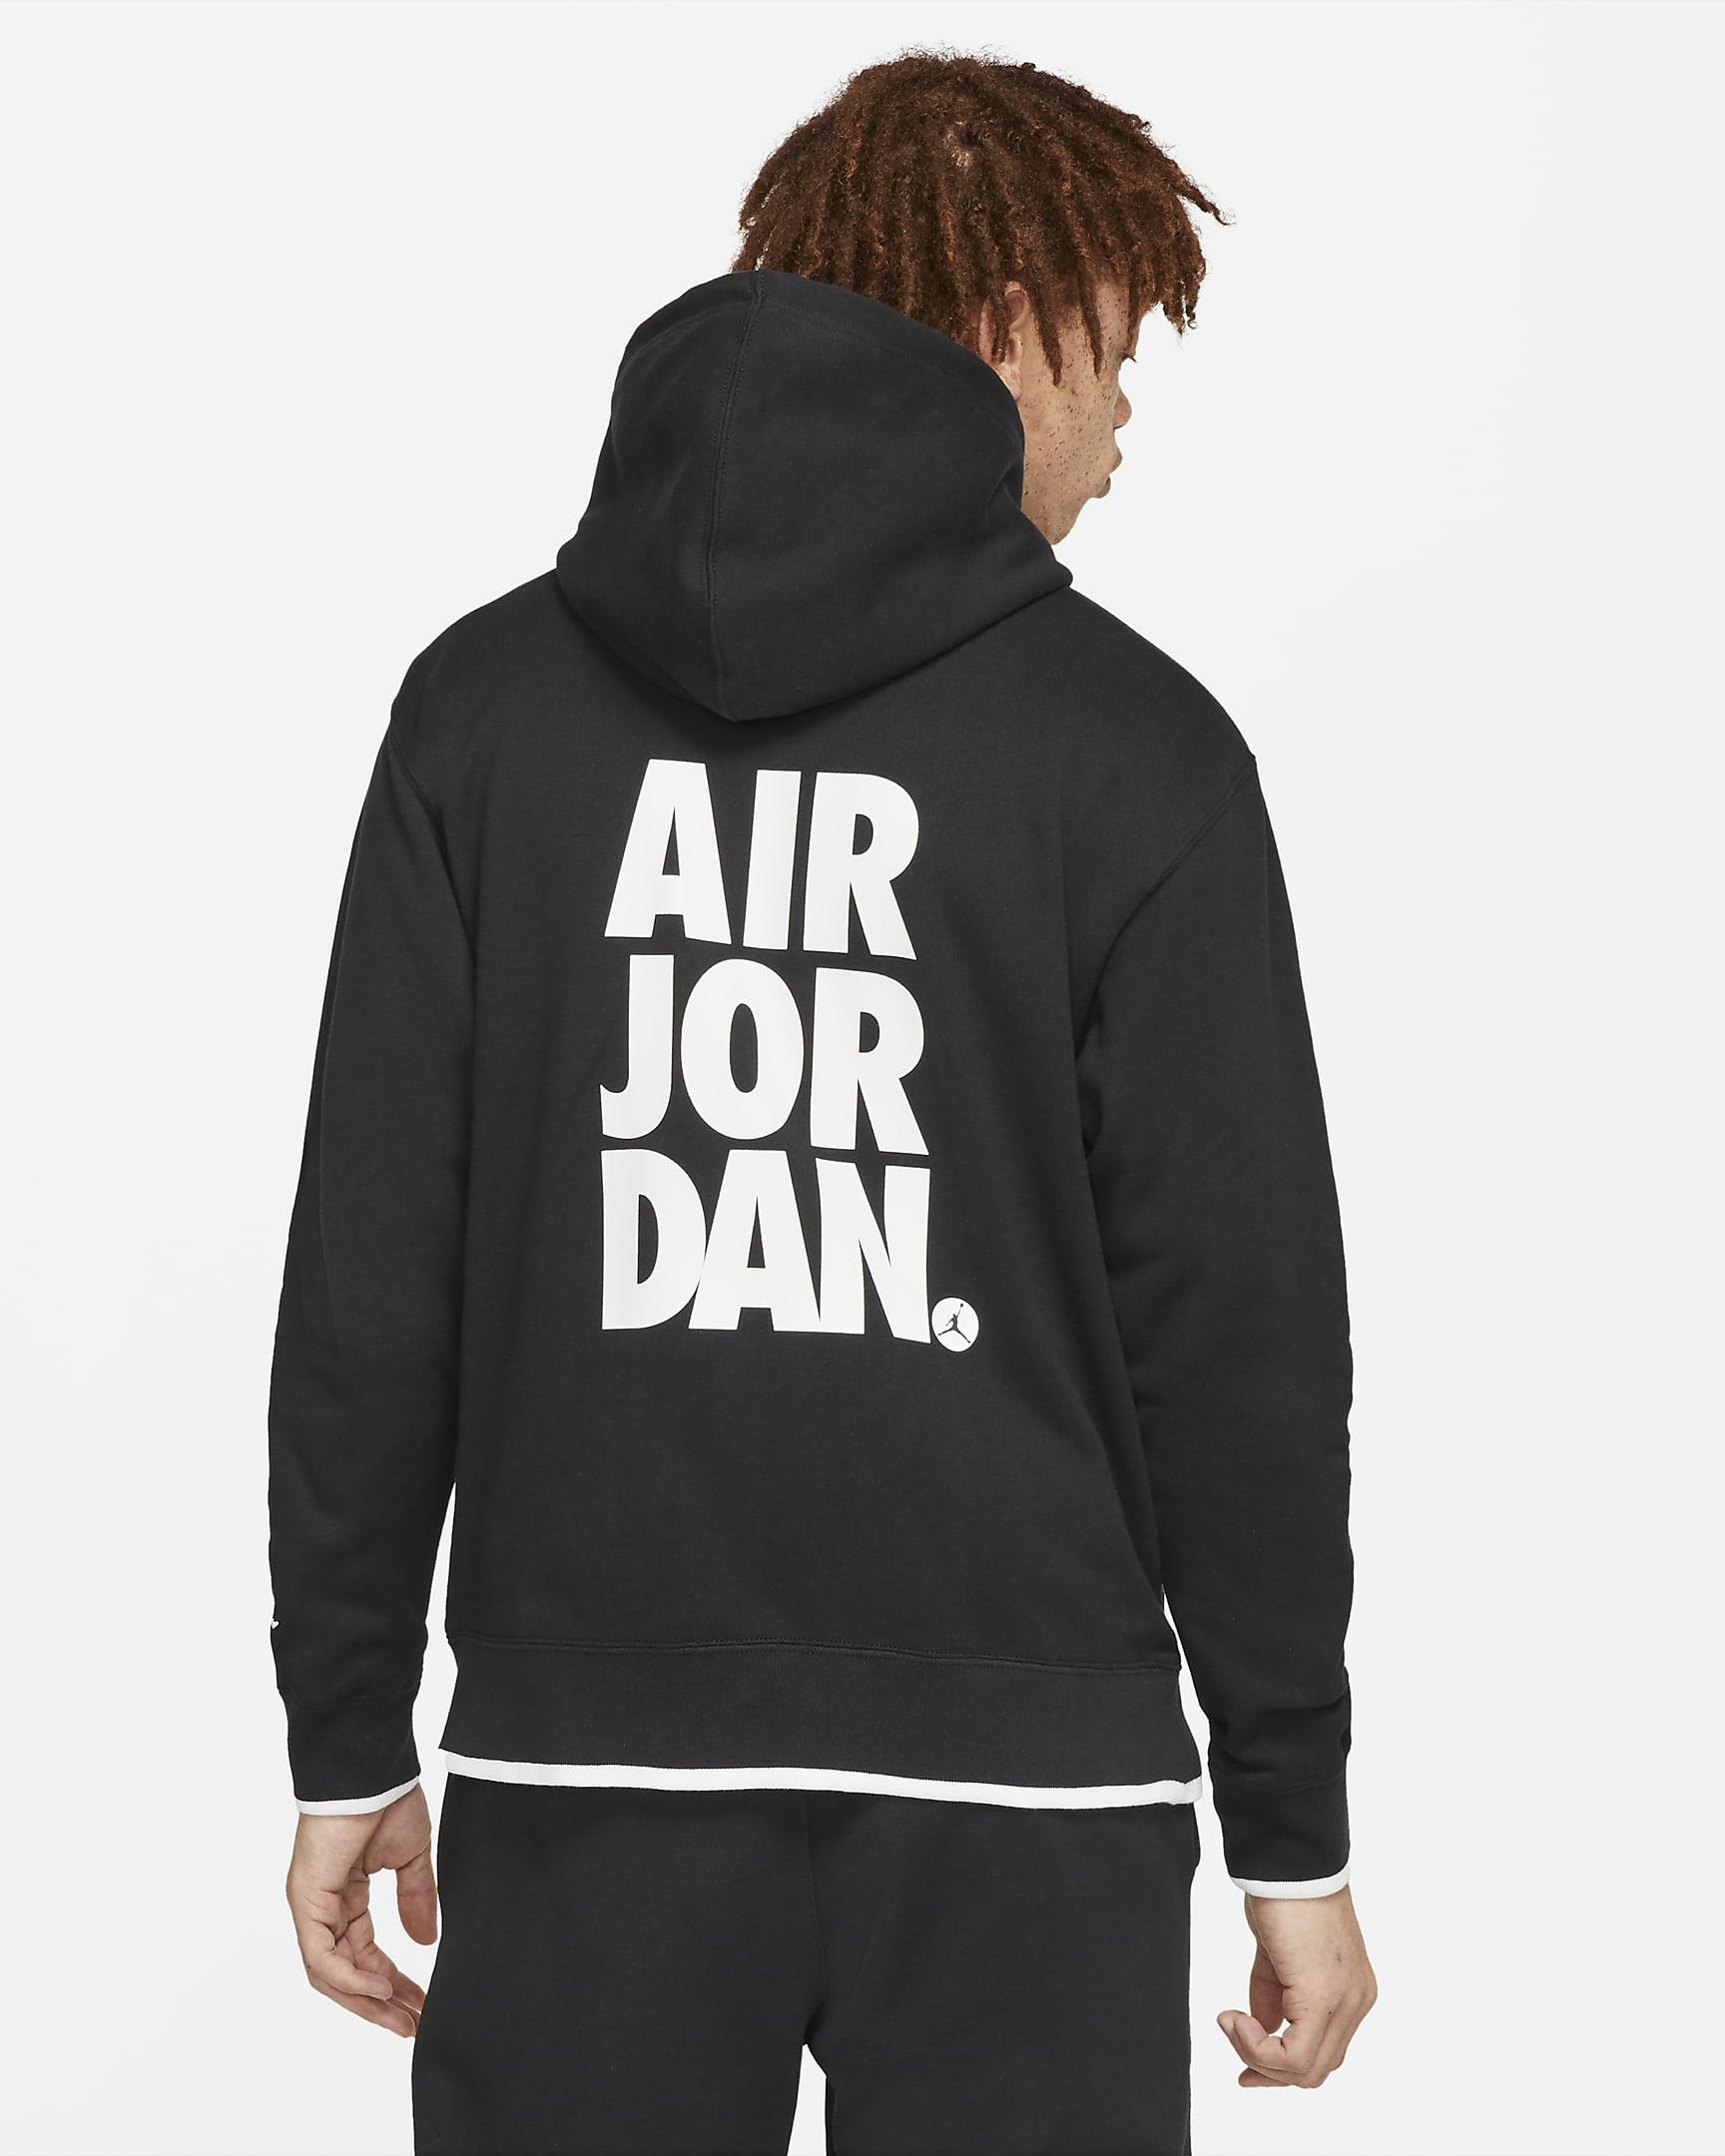 jordan-jumpman-classics-mens-printed-fleece-pullover-hoodie-hz0Q9t-3